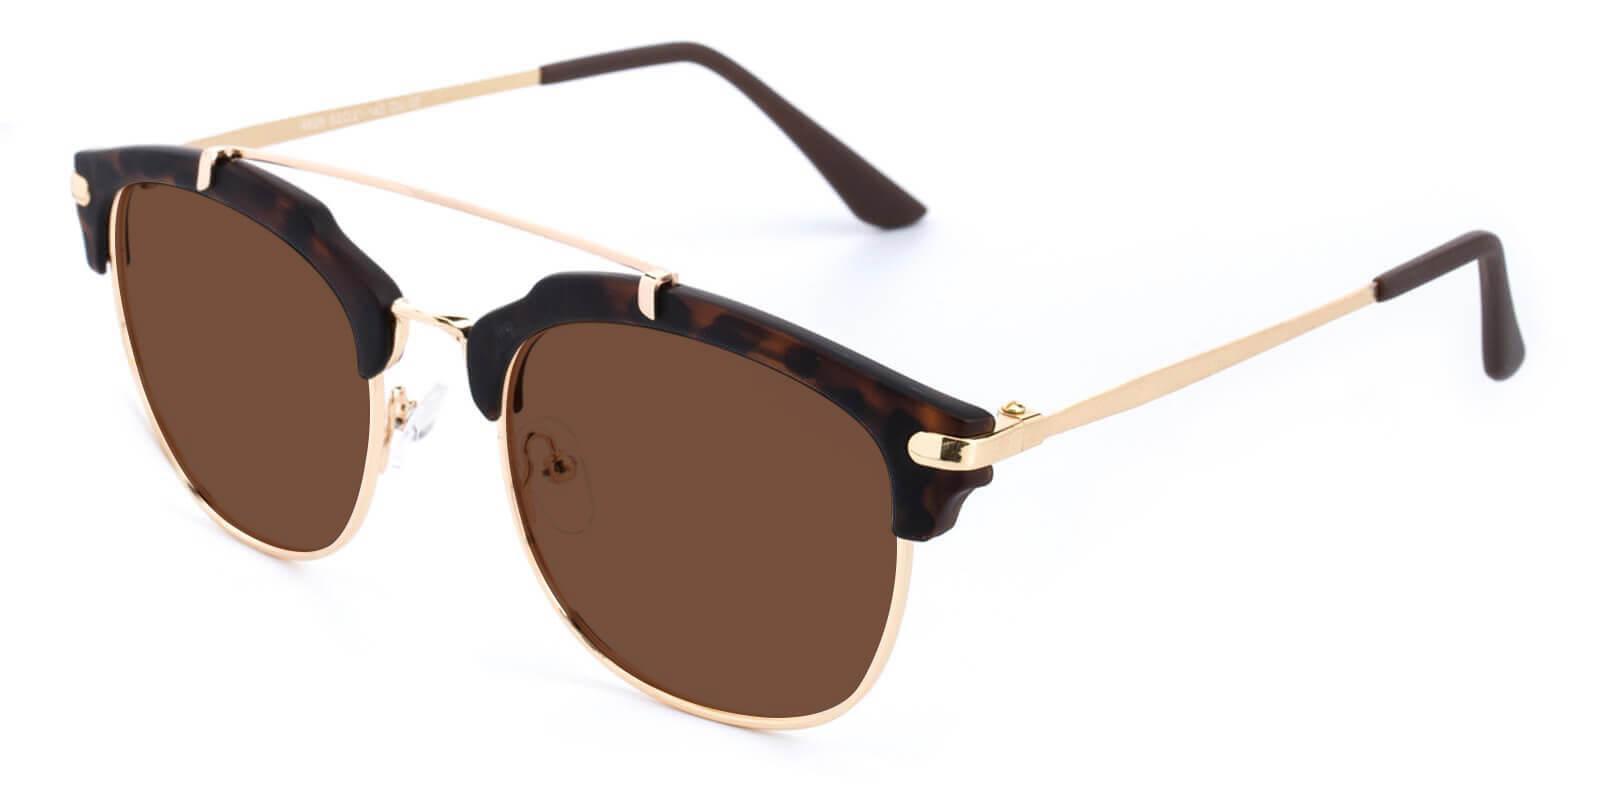 Icychem-Tortoise-Browline-Acetate-Sunglasses-additional1